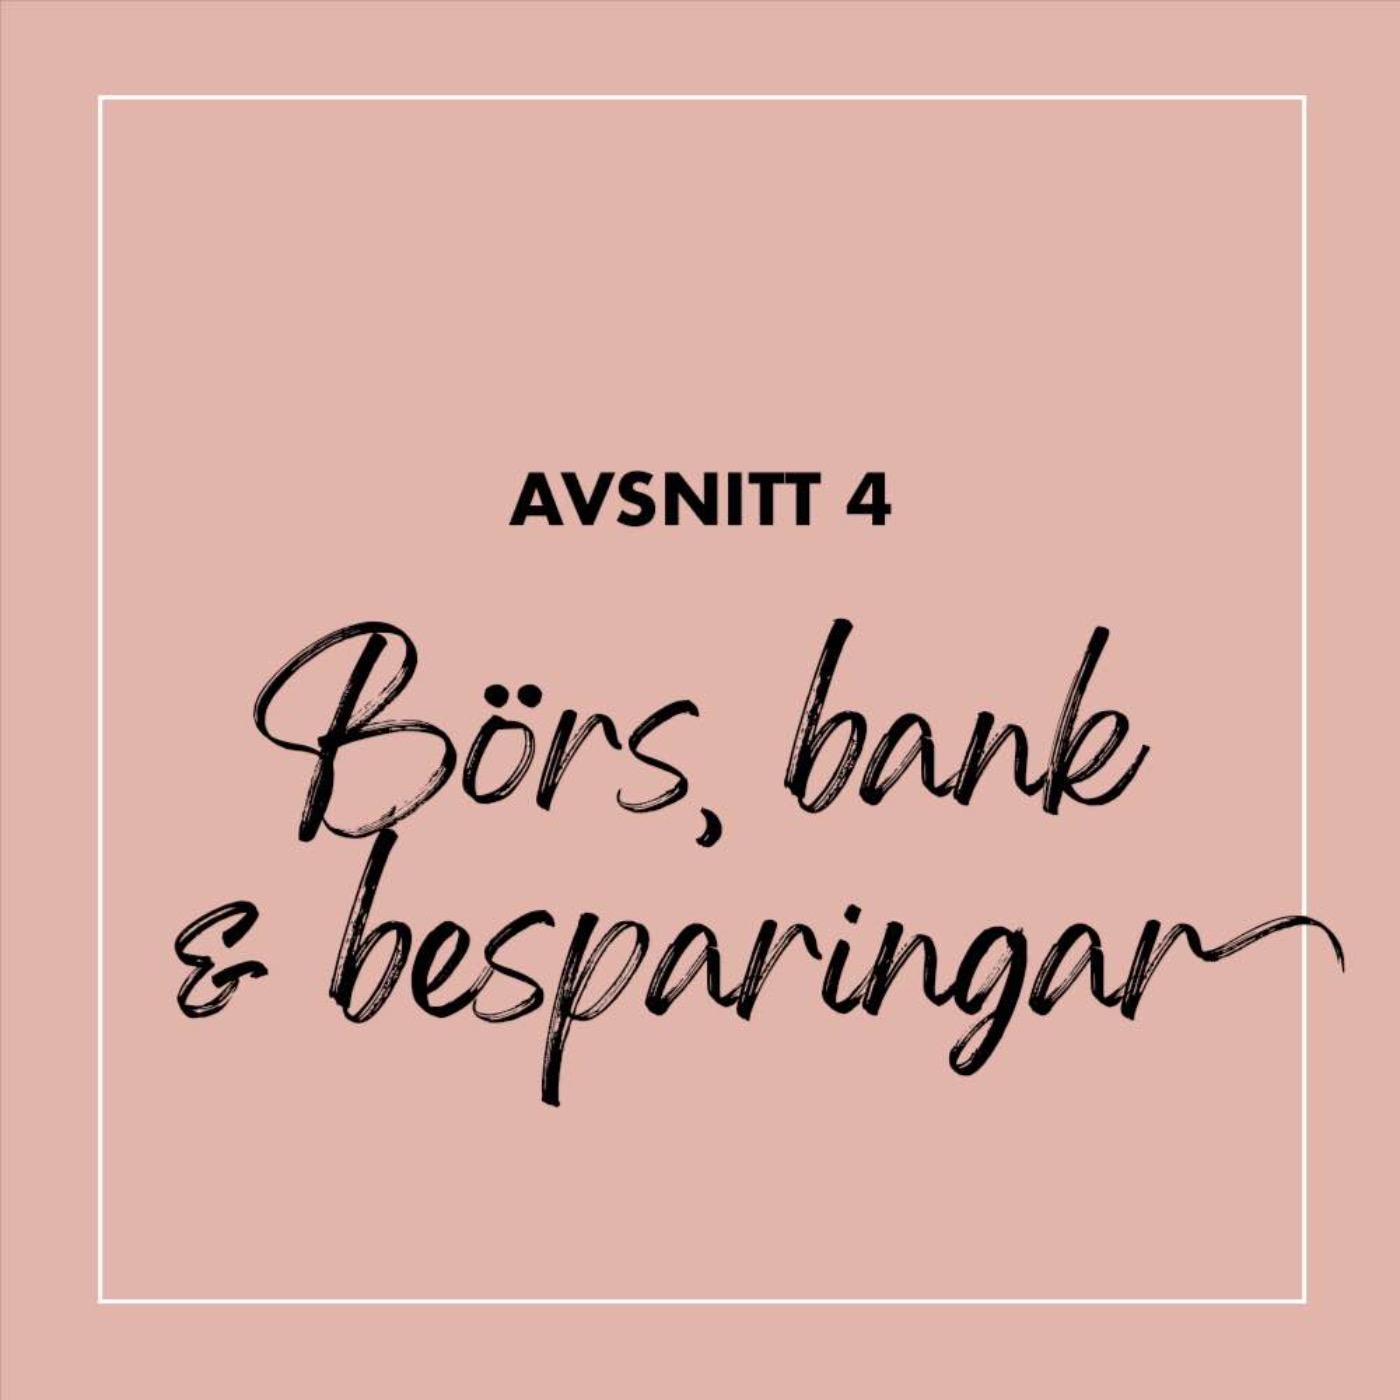 #4 Börs, bank & besparingar